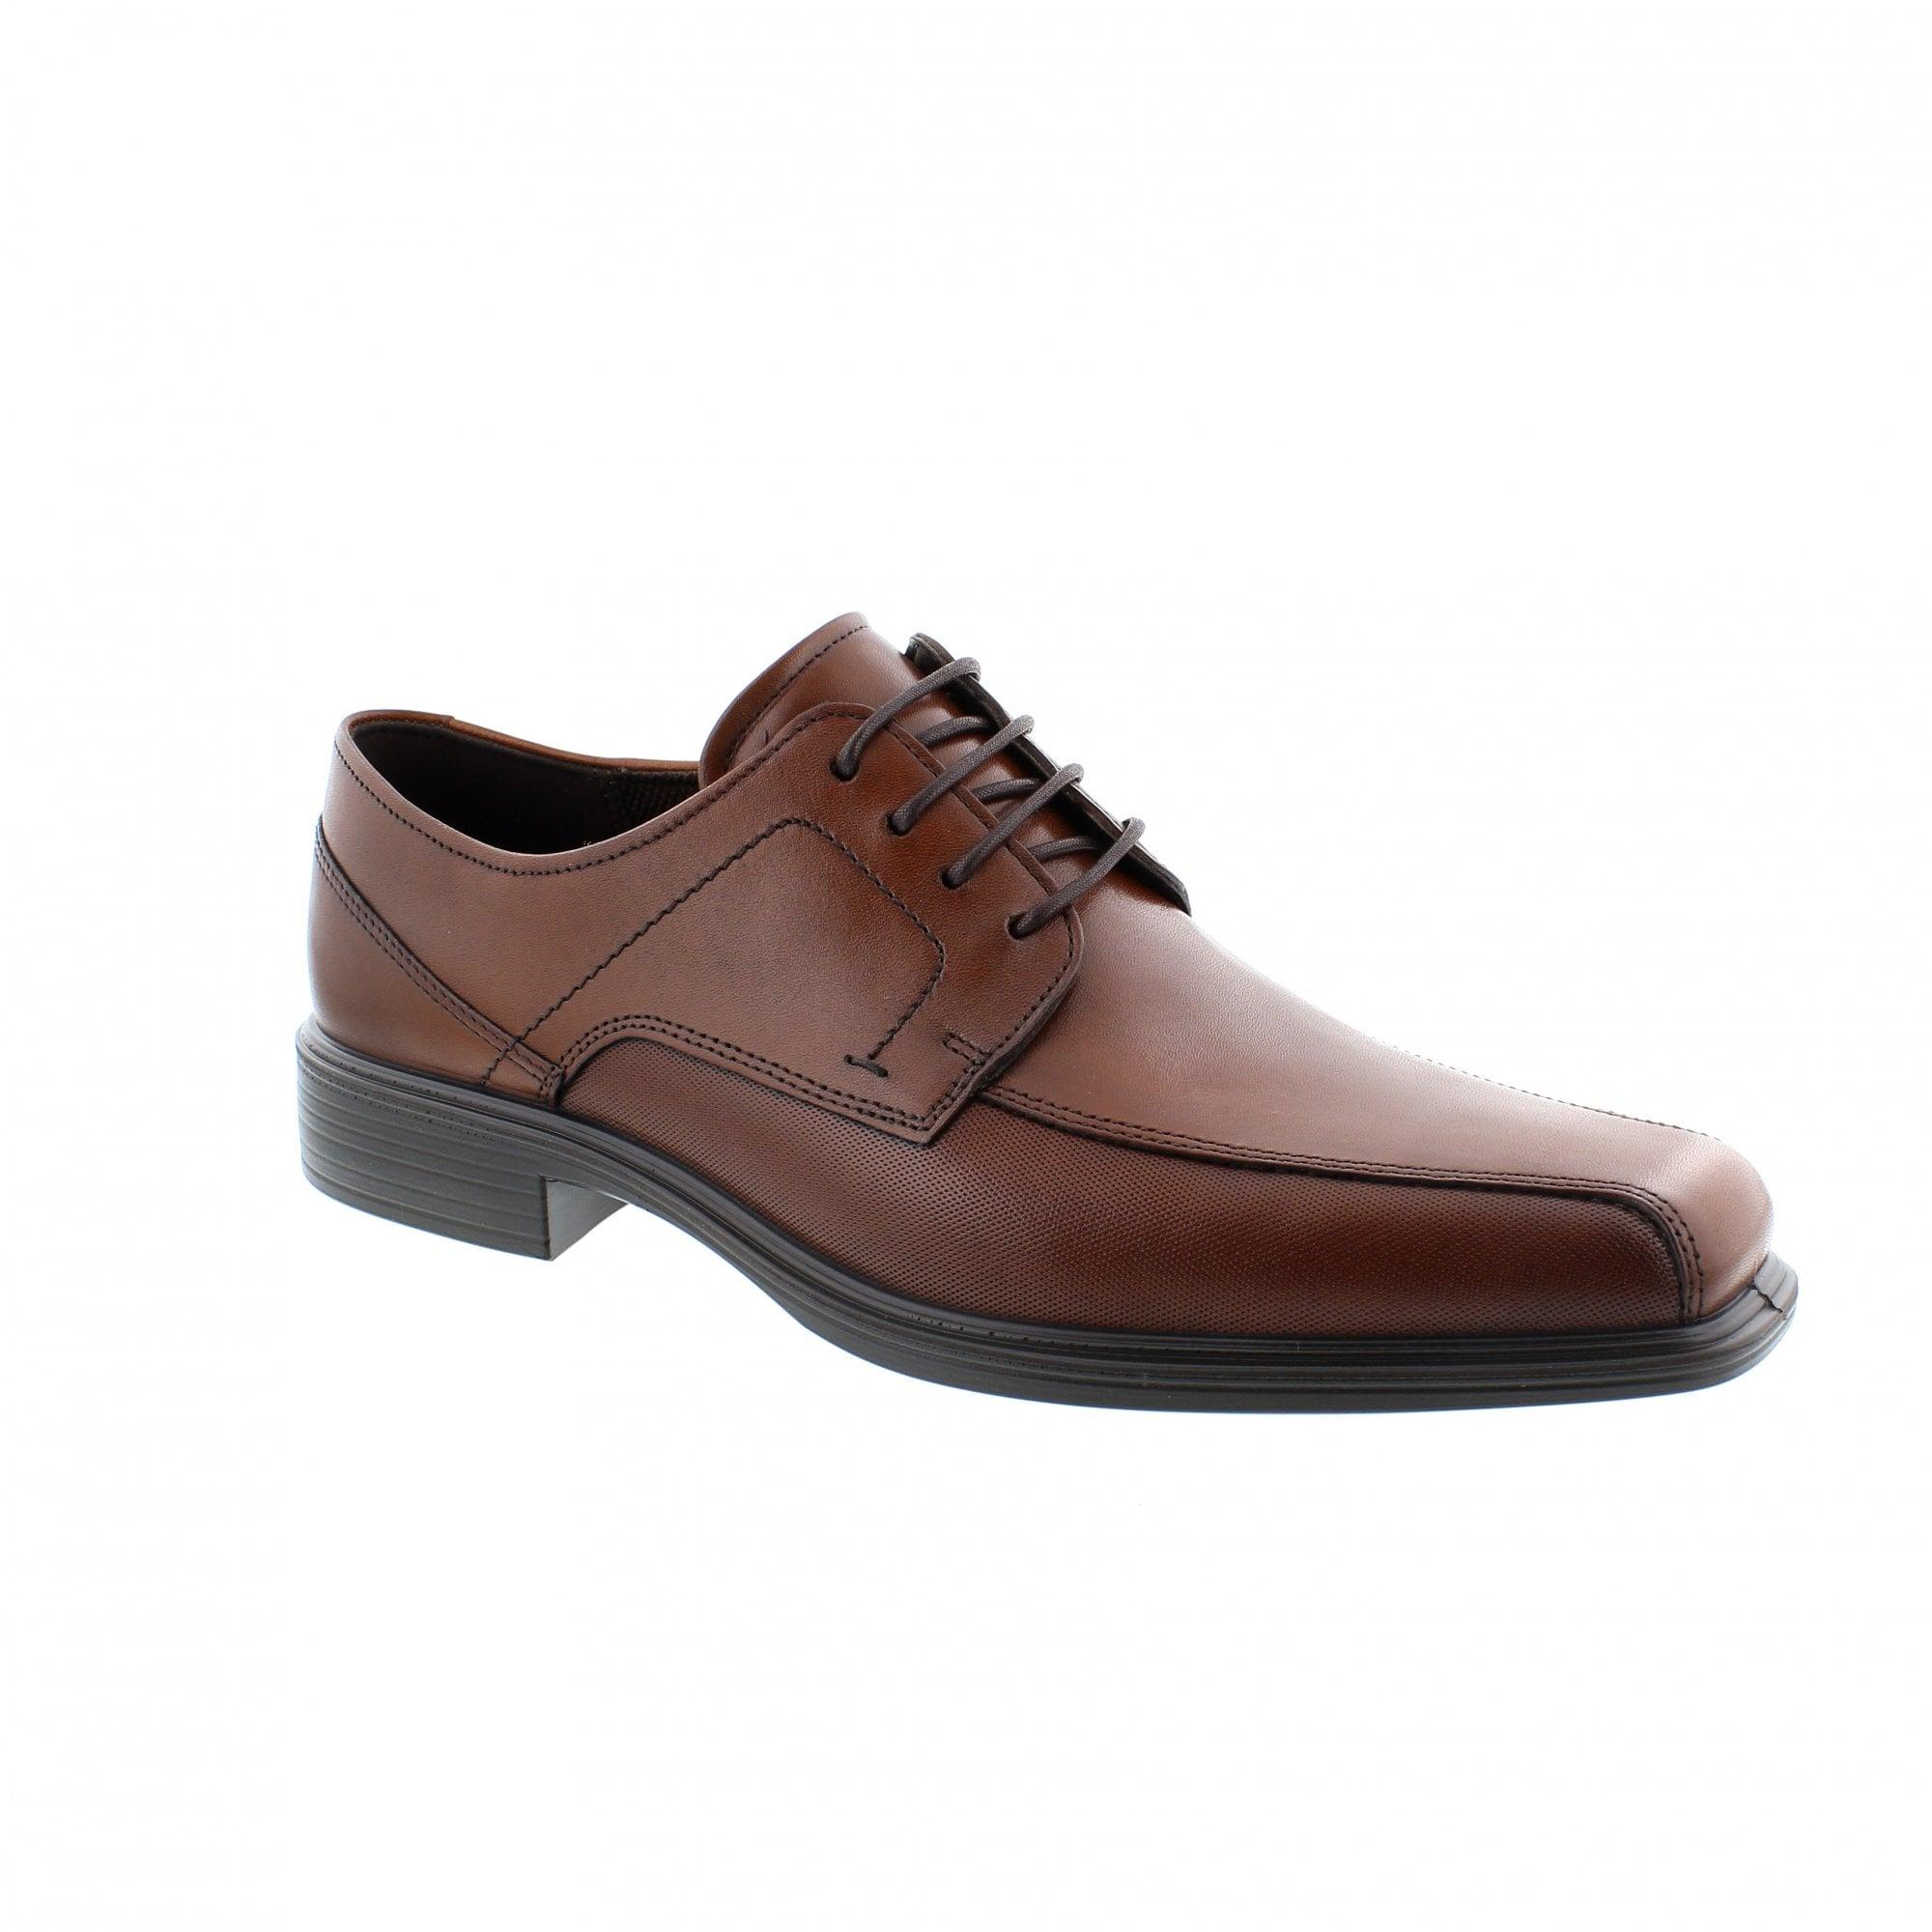 fc24bdc63b14 Ecco Johannesburg 623544-01053 Mens Lace Up Shoes